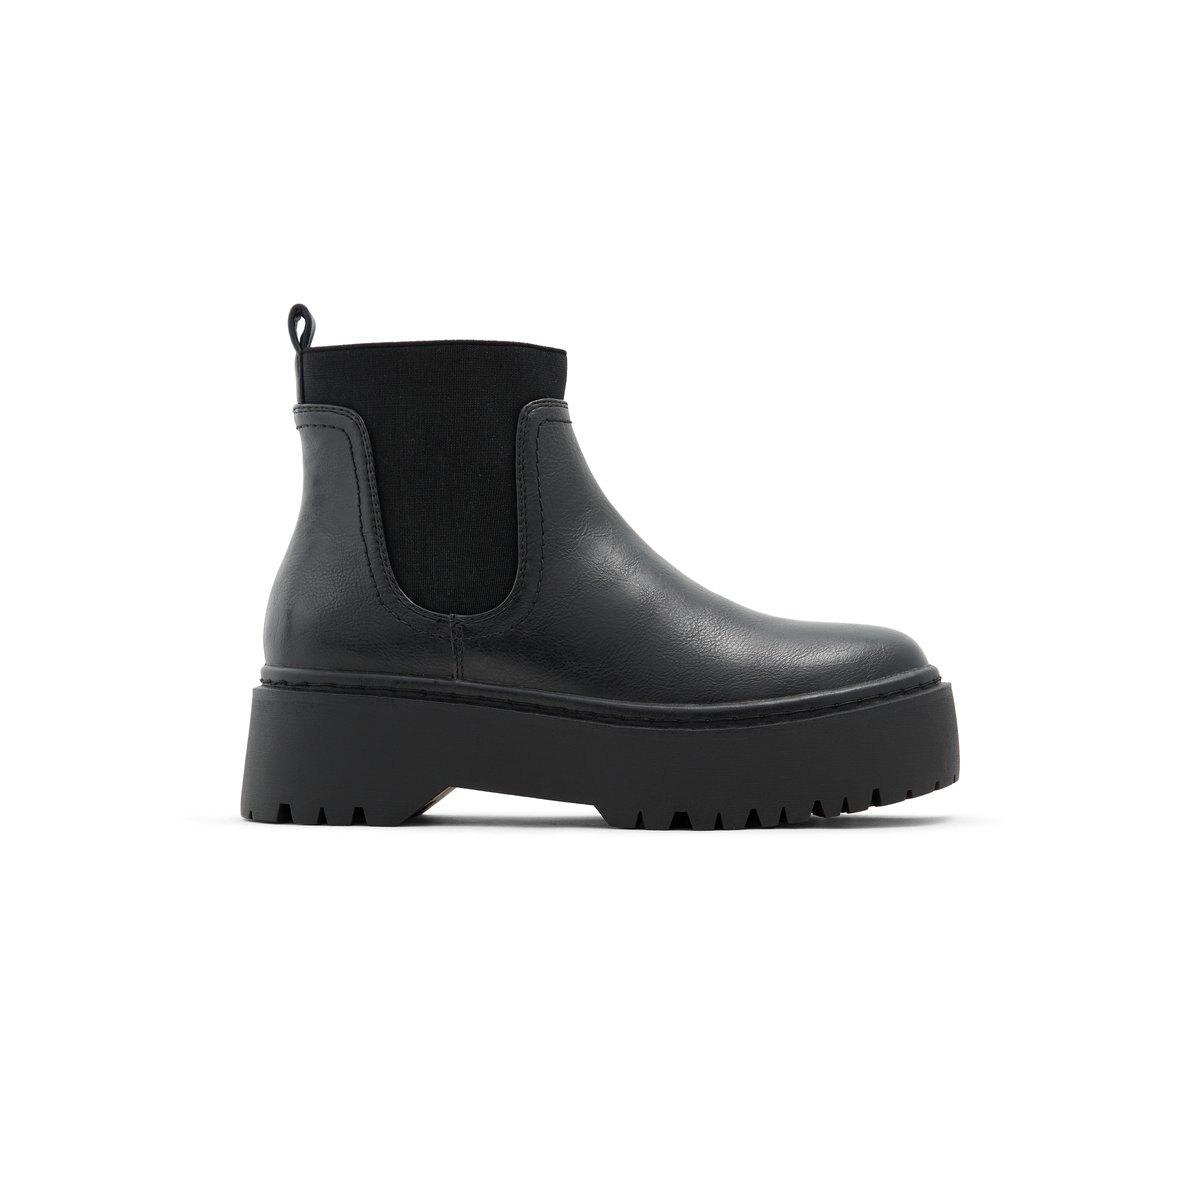 Flatform Black Women's Chelsea Boots